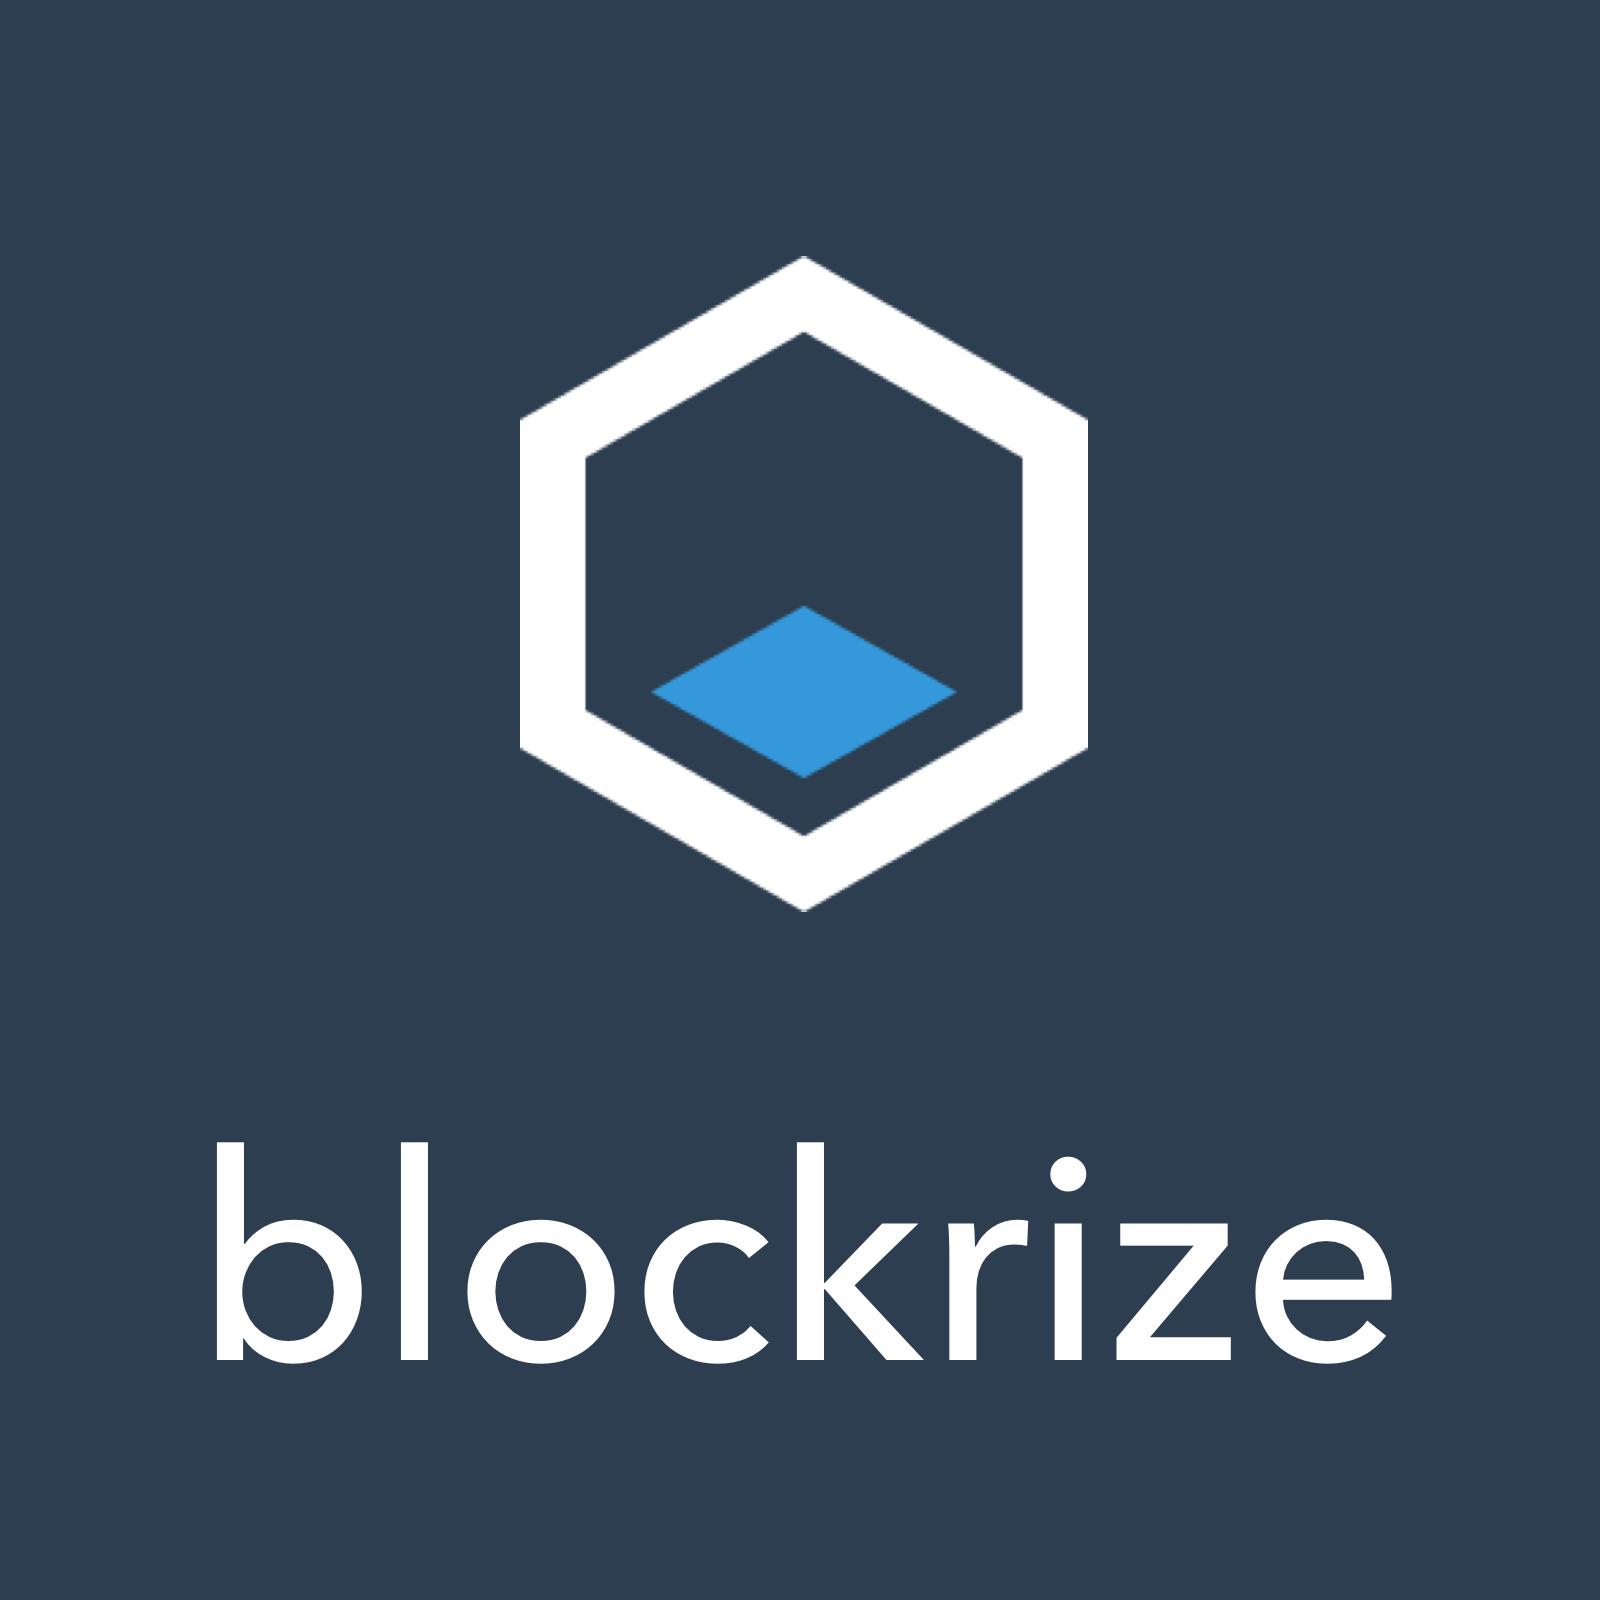 blockrize